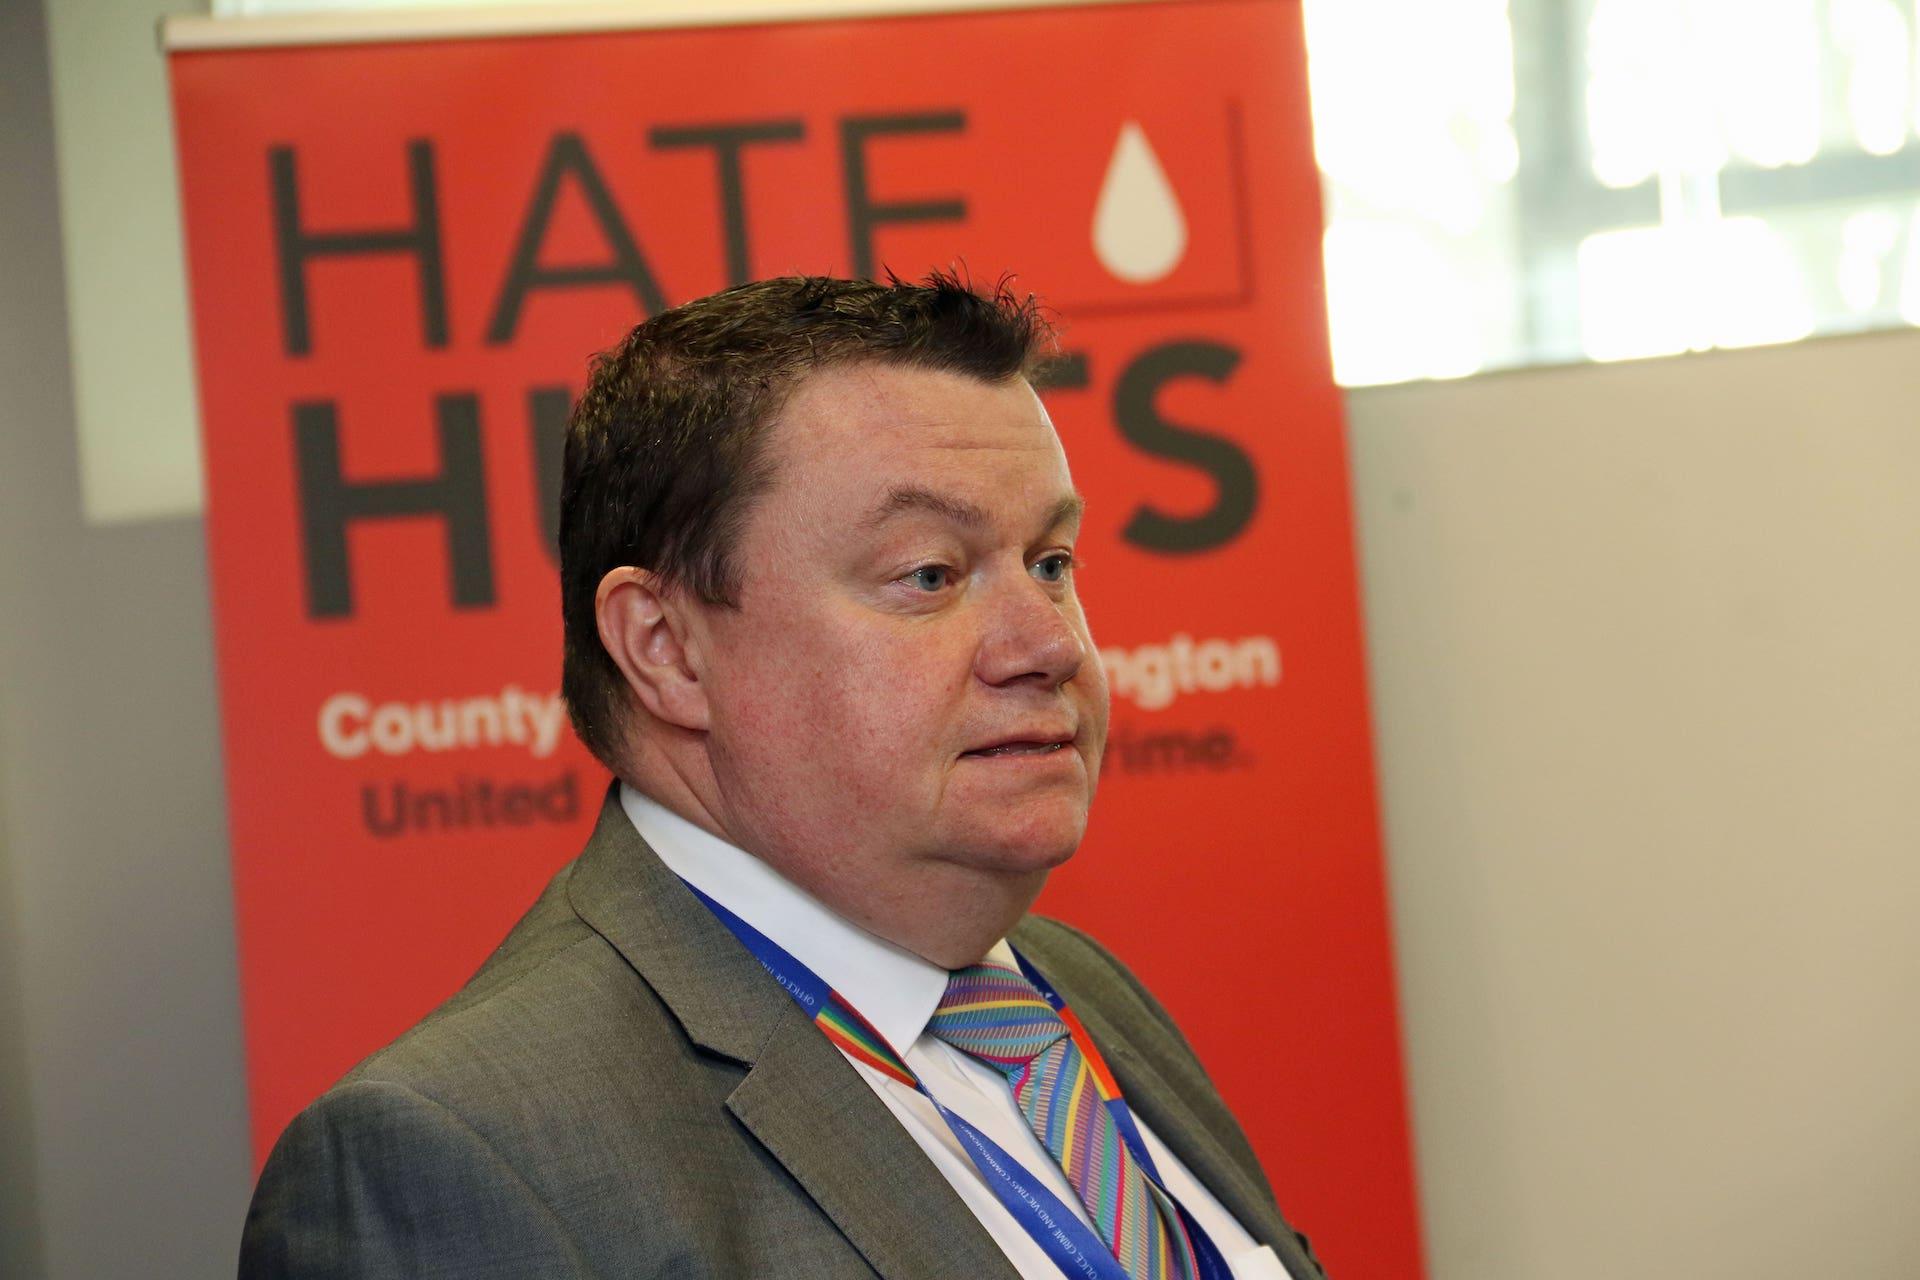 Steve White Hate Hurts Campaign